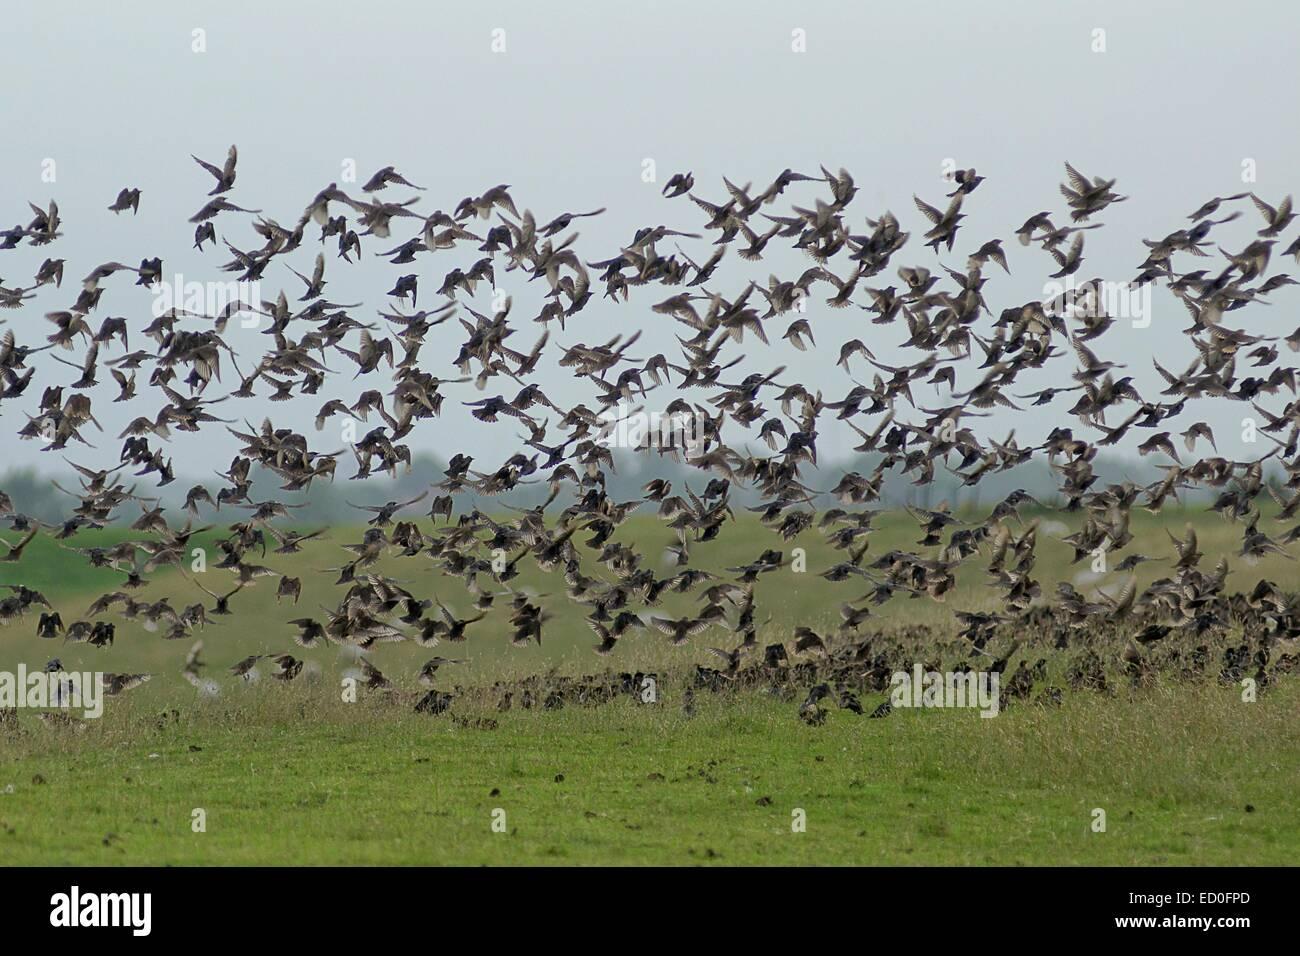 Flock of starlings taking off, Leer, Lower Saxony, Germany - Stock Image